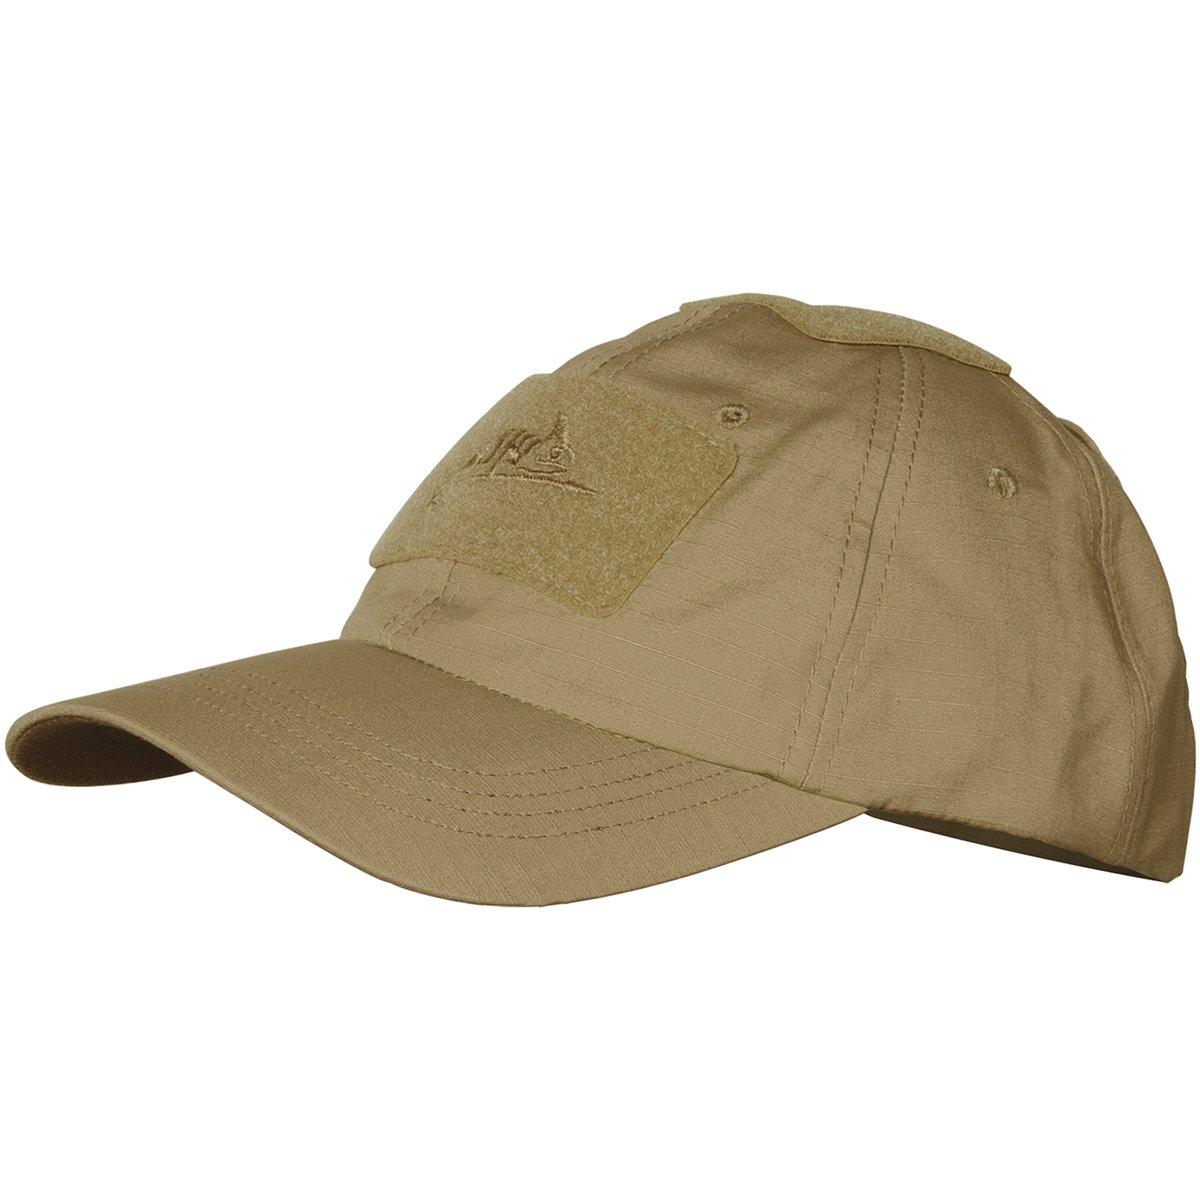 Helikon Coyote Tan Baseball Cap Cotton Ripstop operator hat